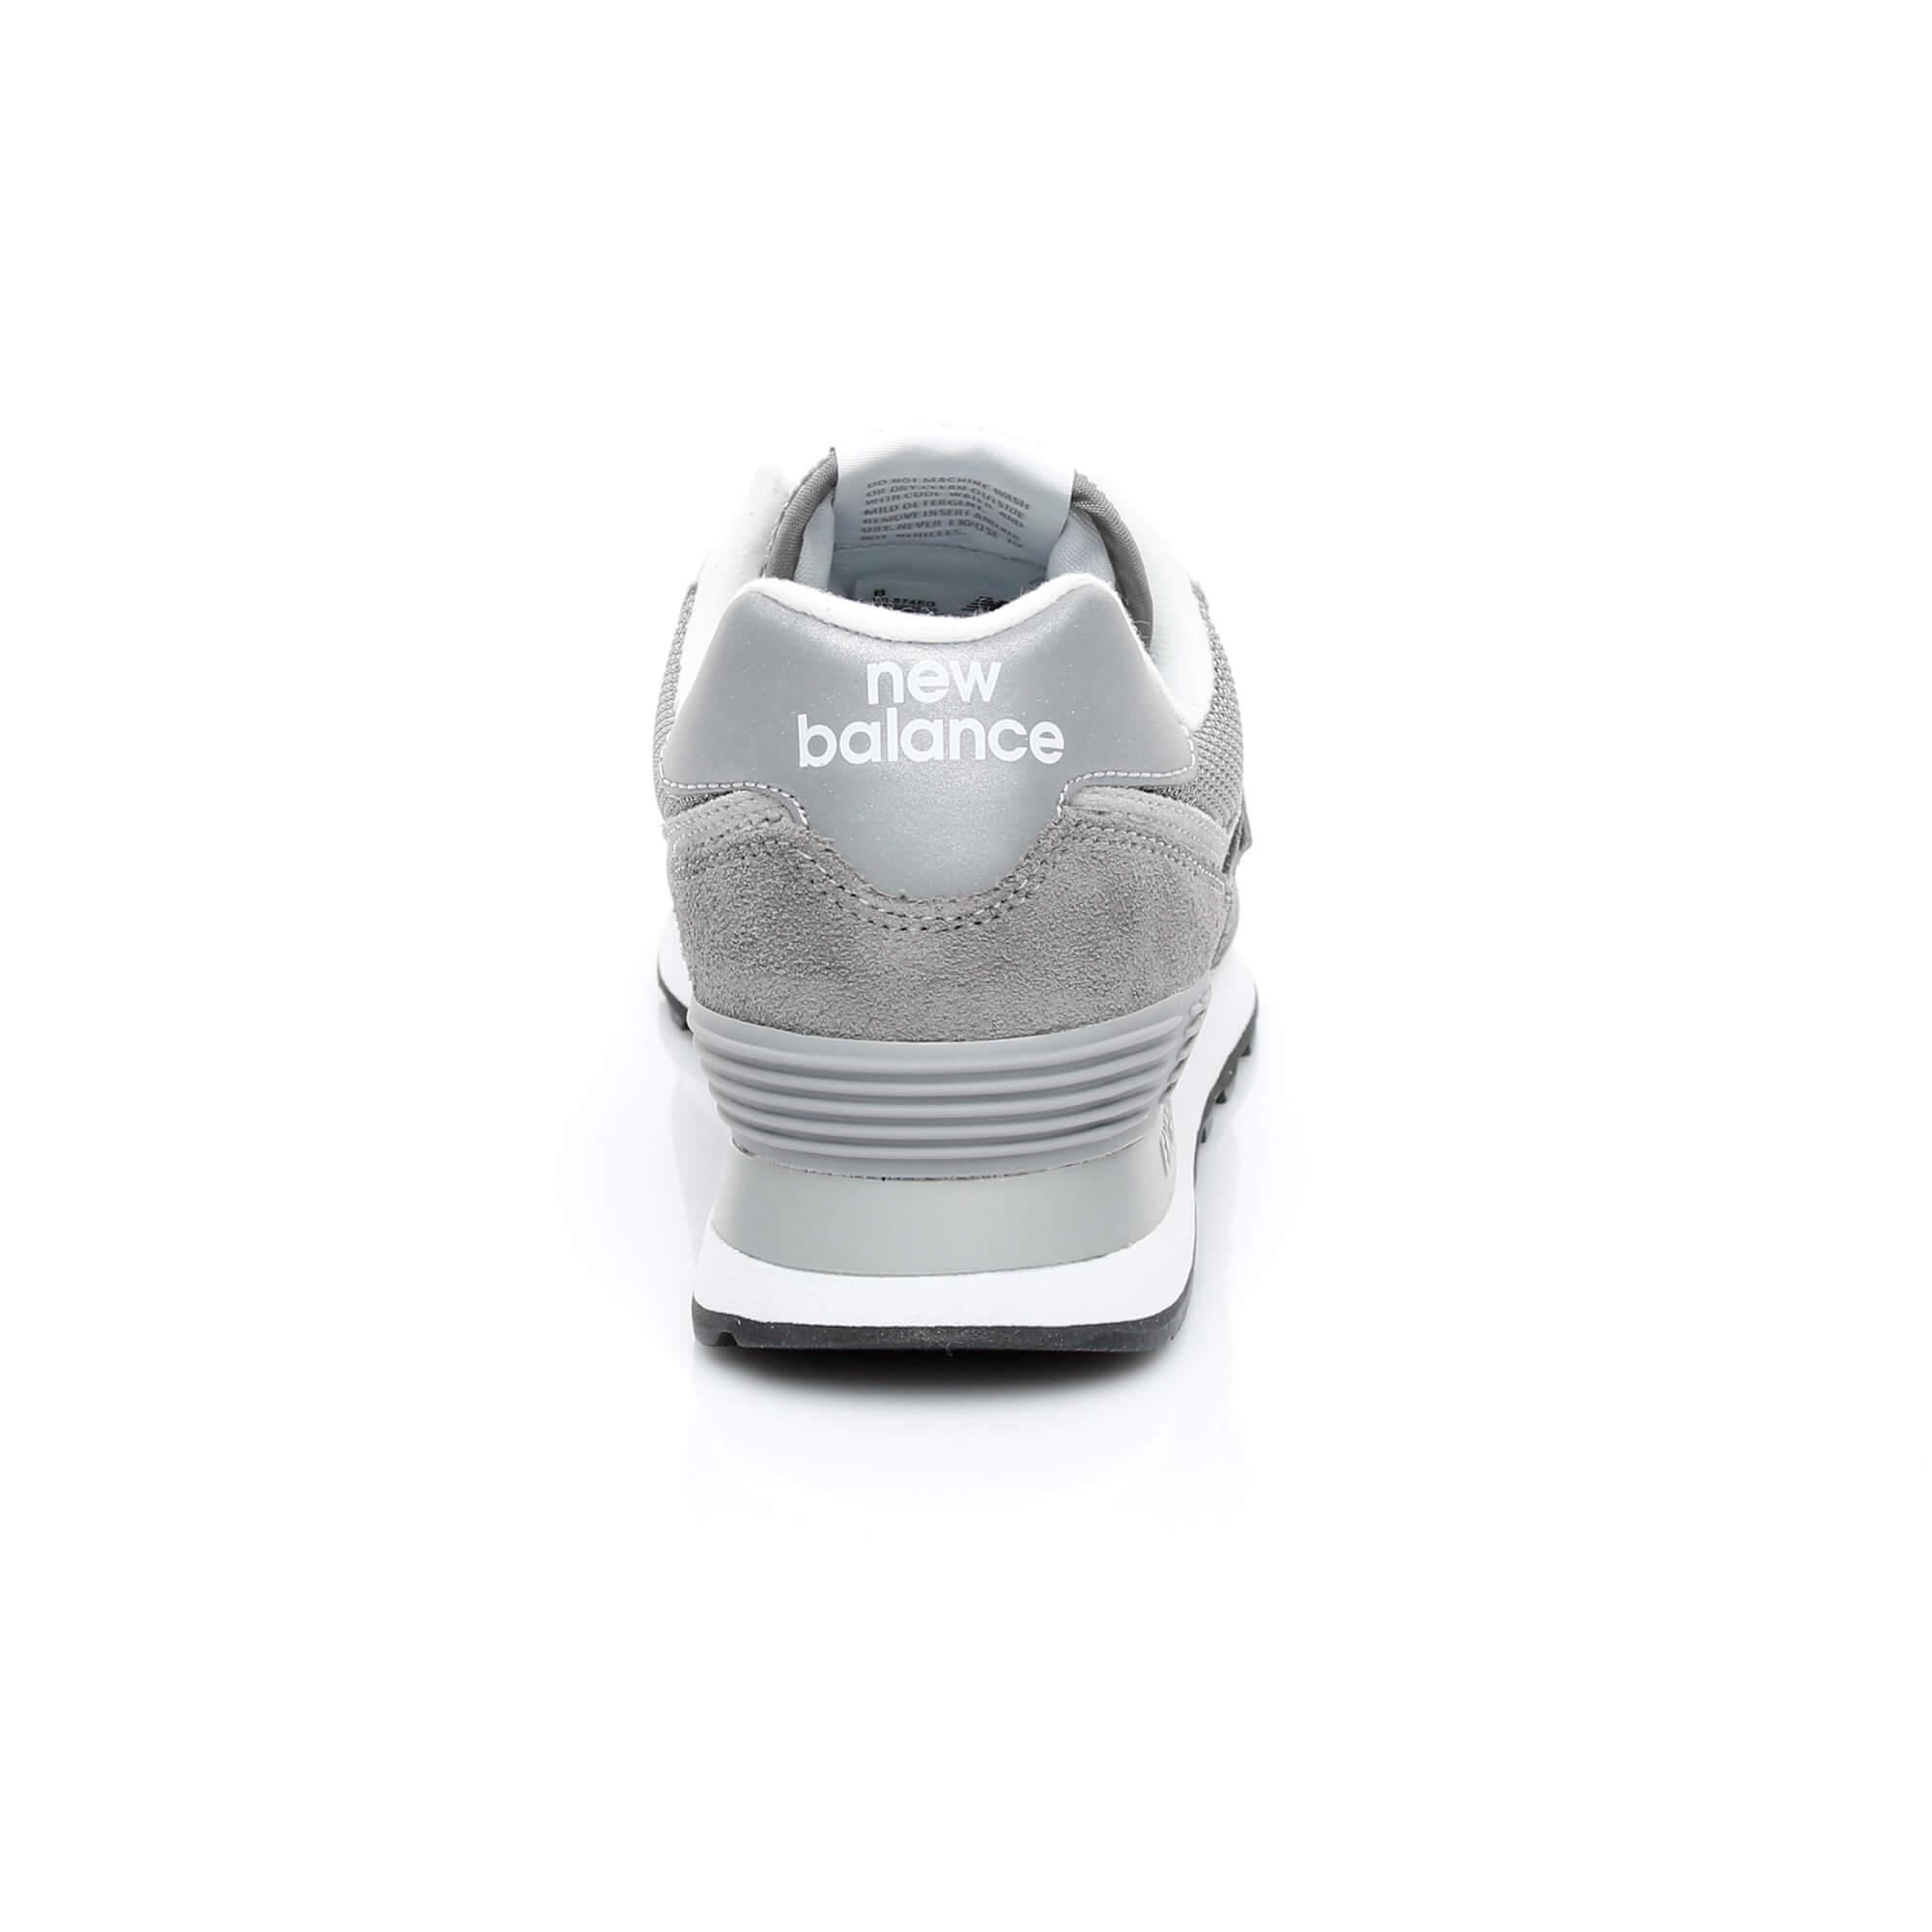 New Balance Bowl 574 Kadın Gri Sneaker